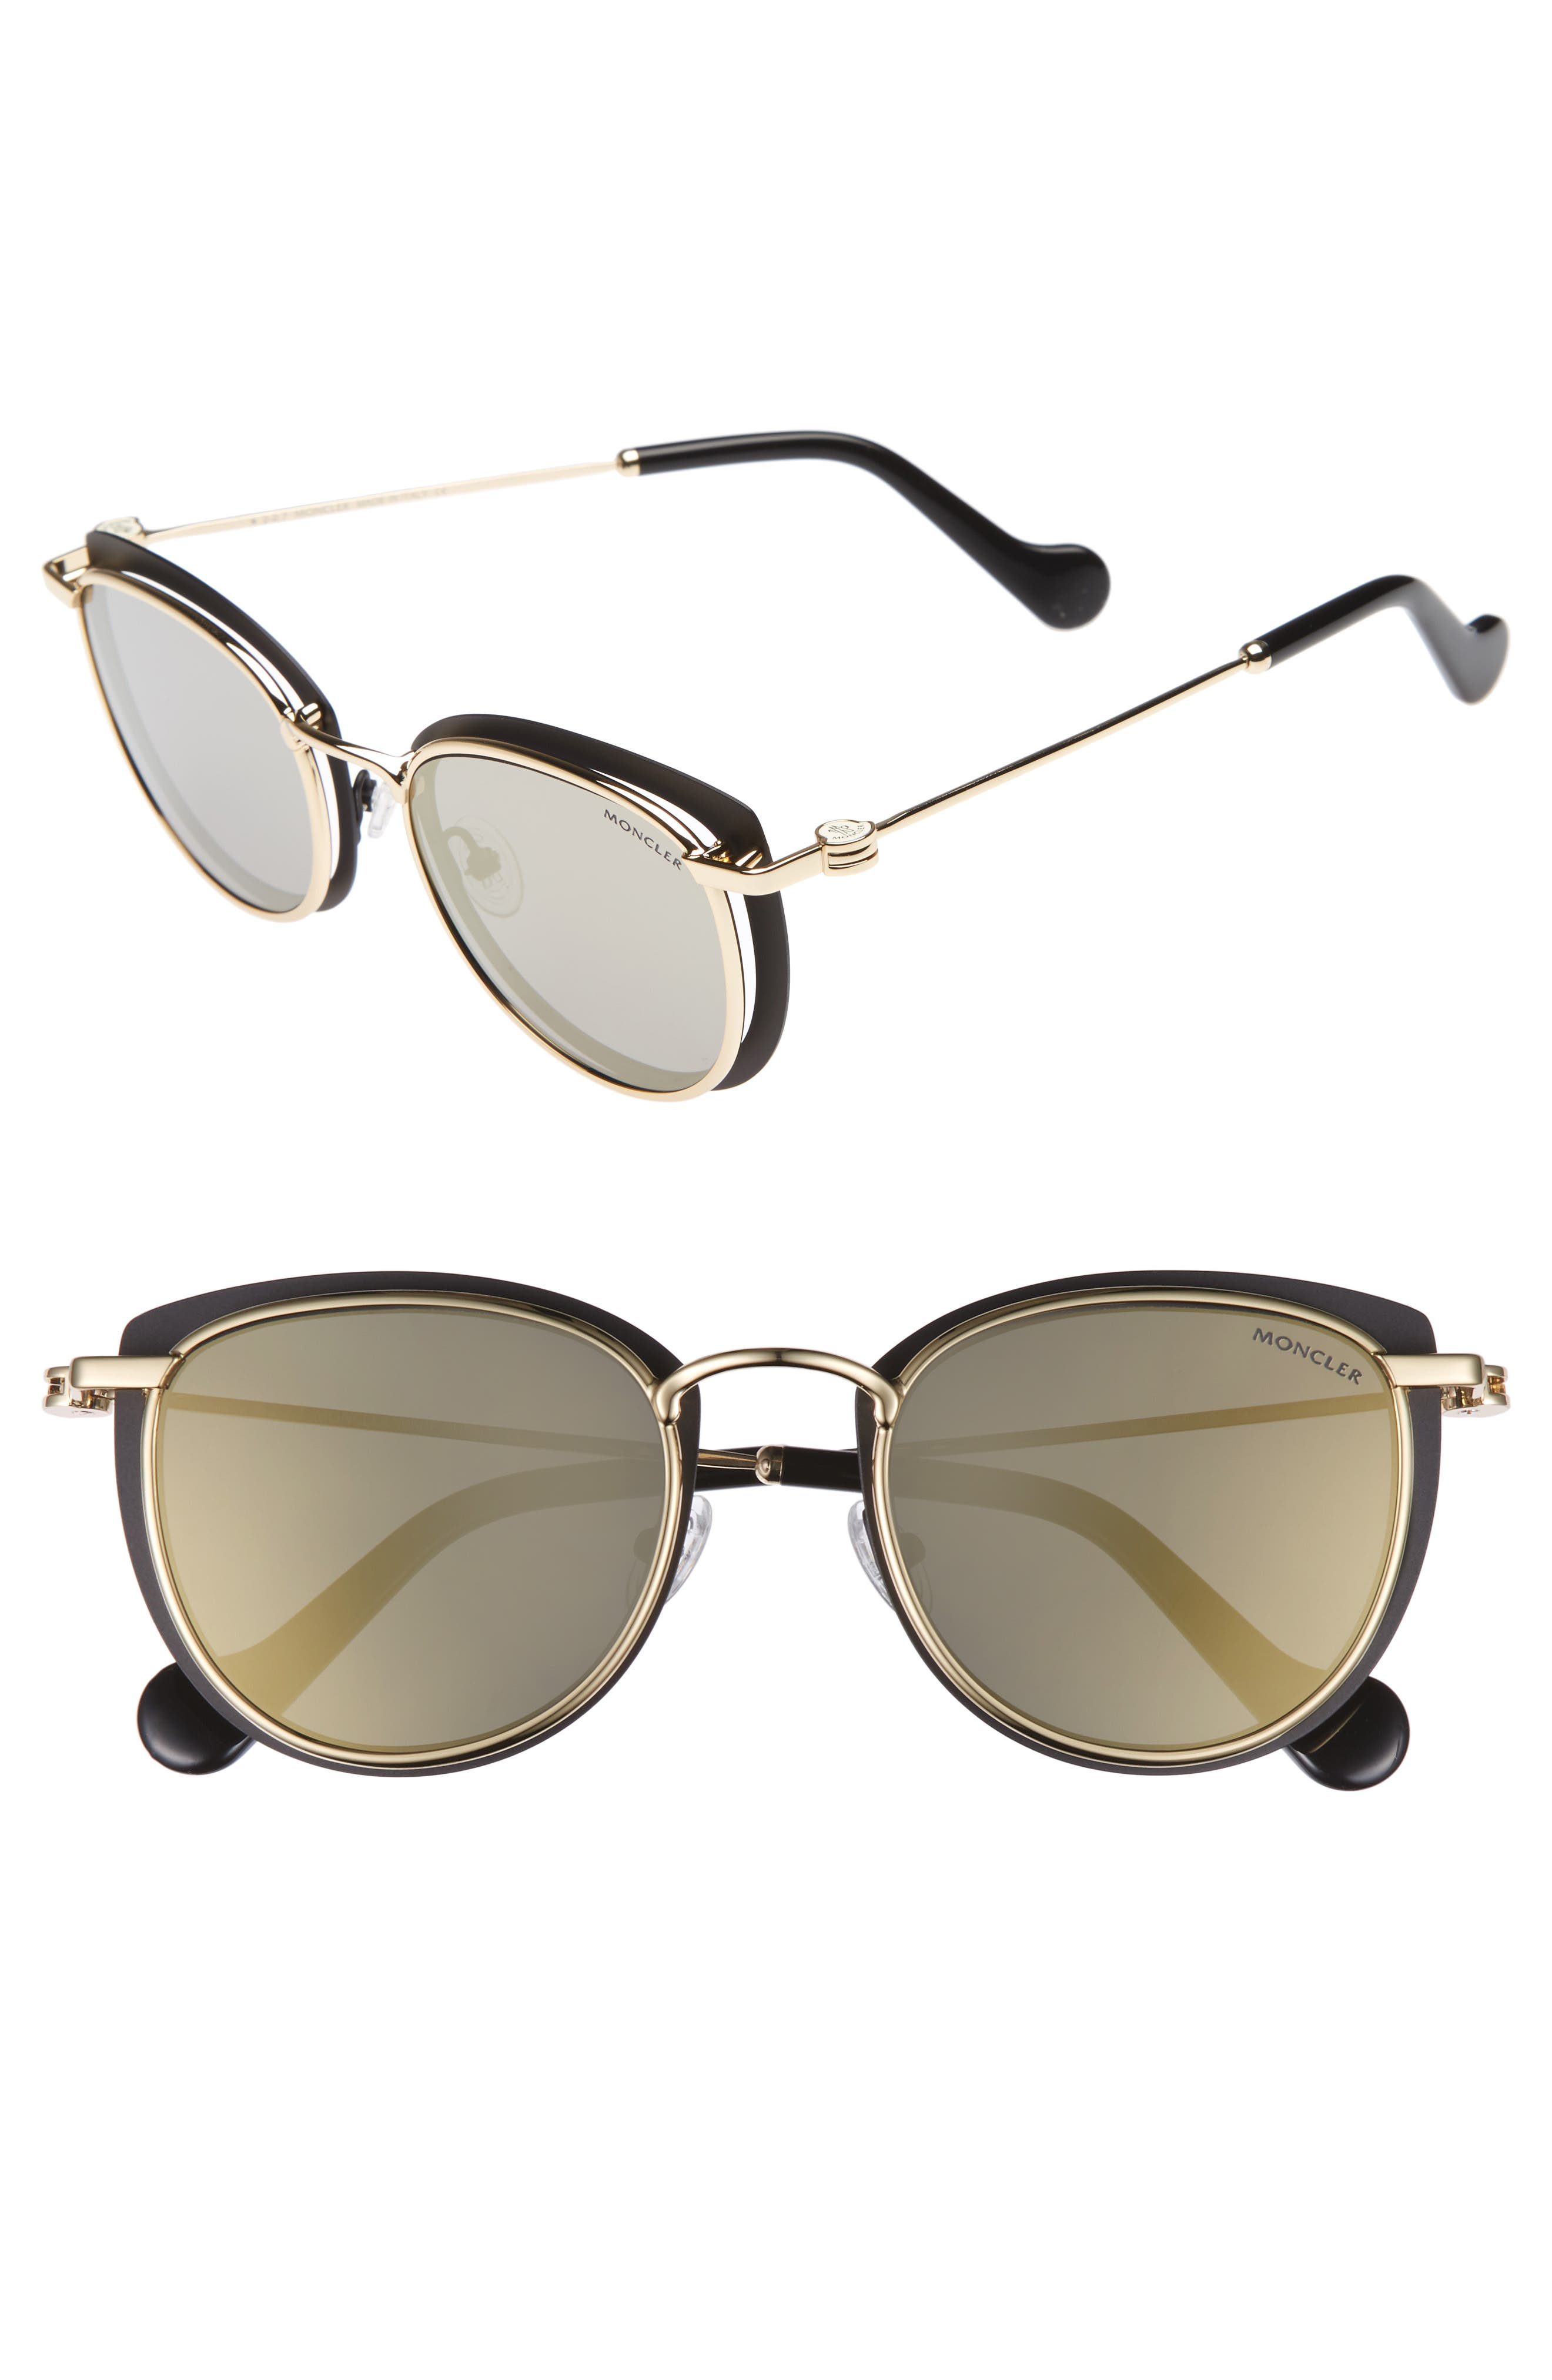 50mm Mirrored Geometric Sunglasses,                         Main,                         color, Black/ Pale Gold/ Smoke/ Gold